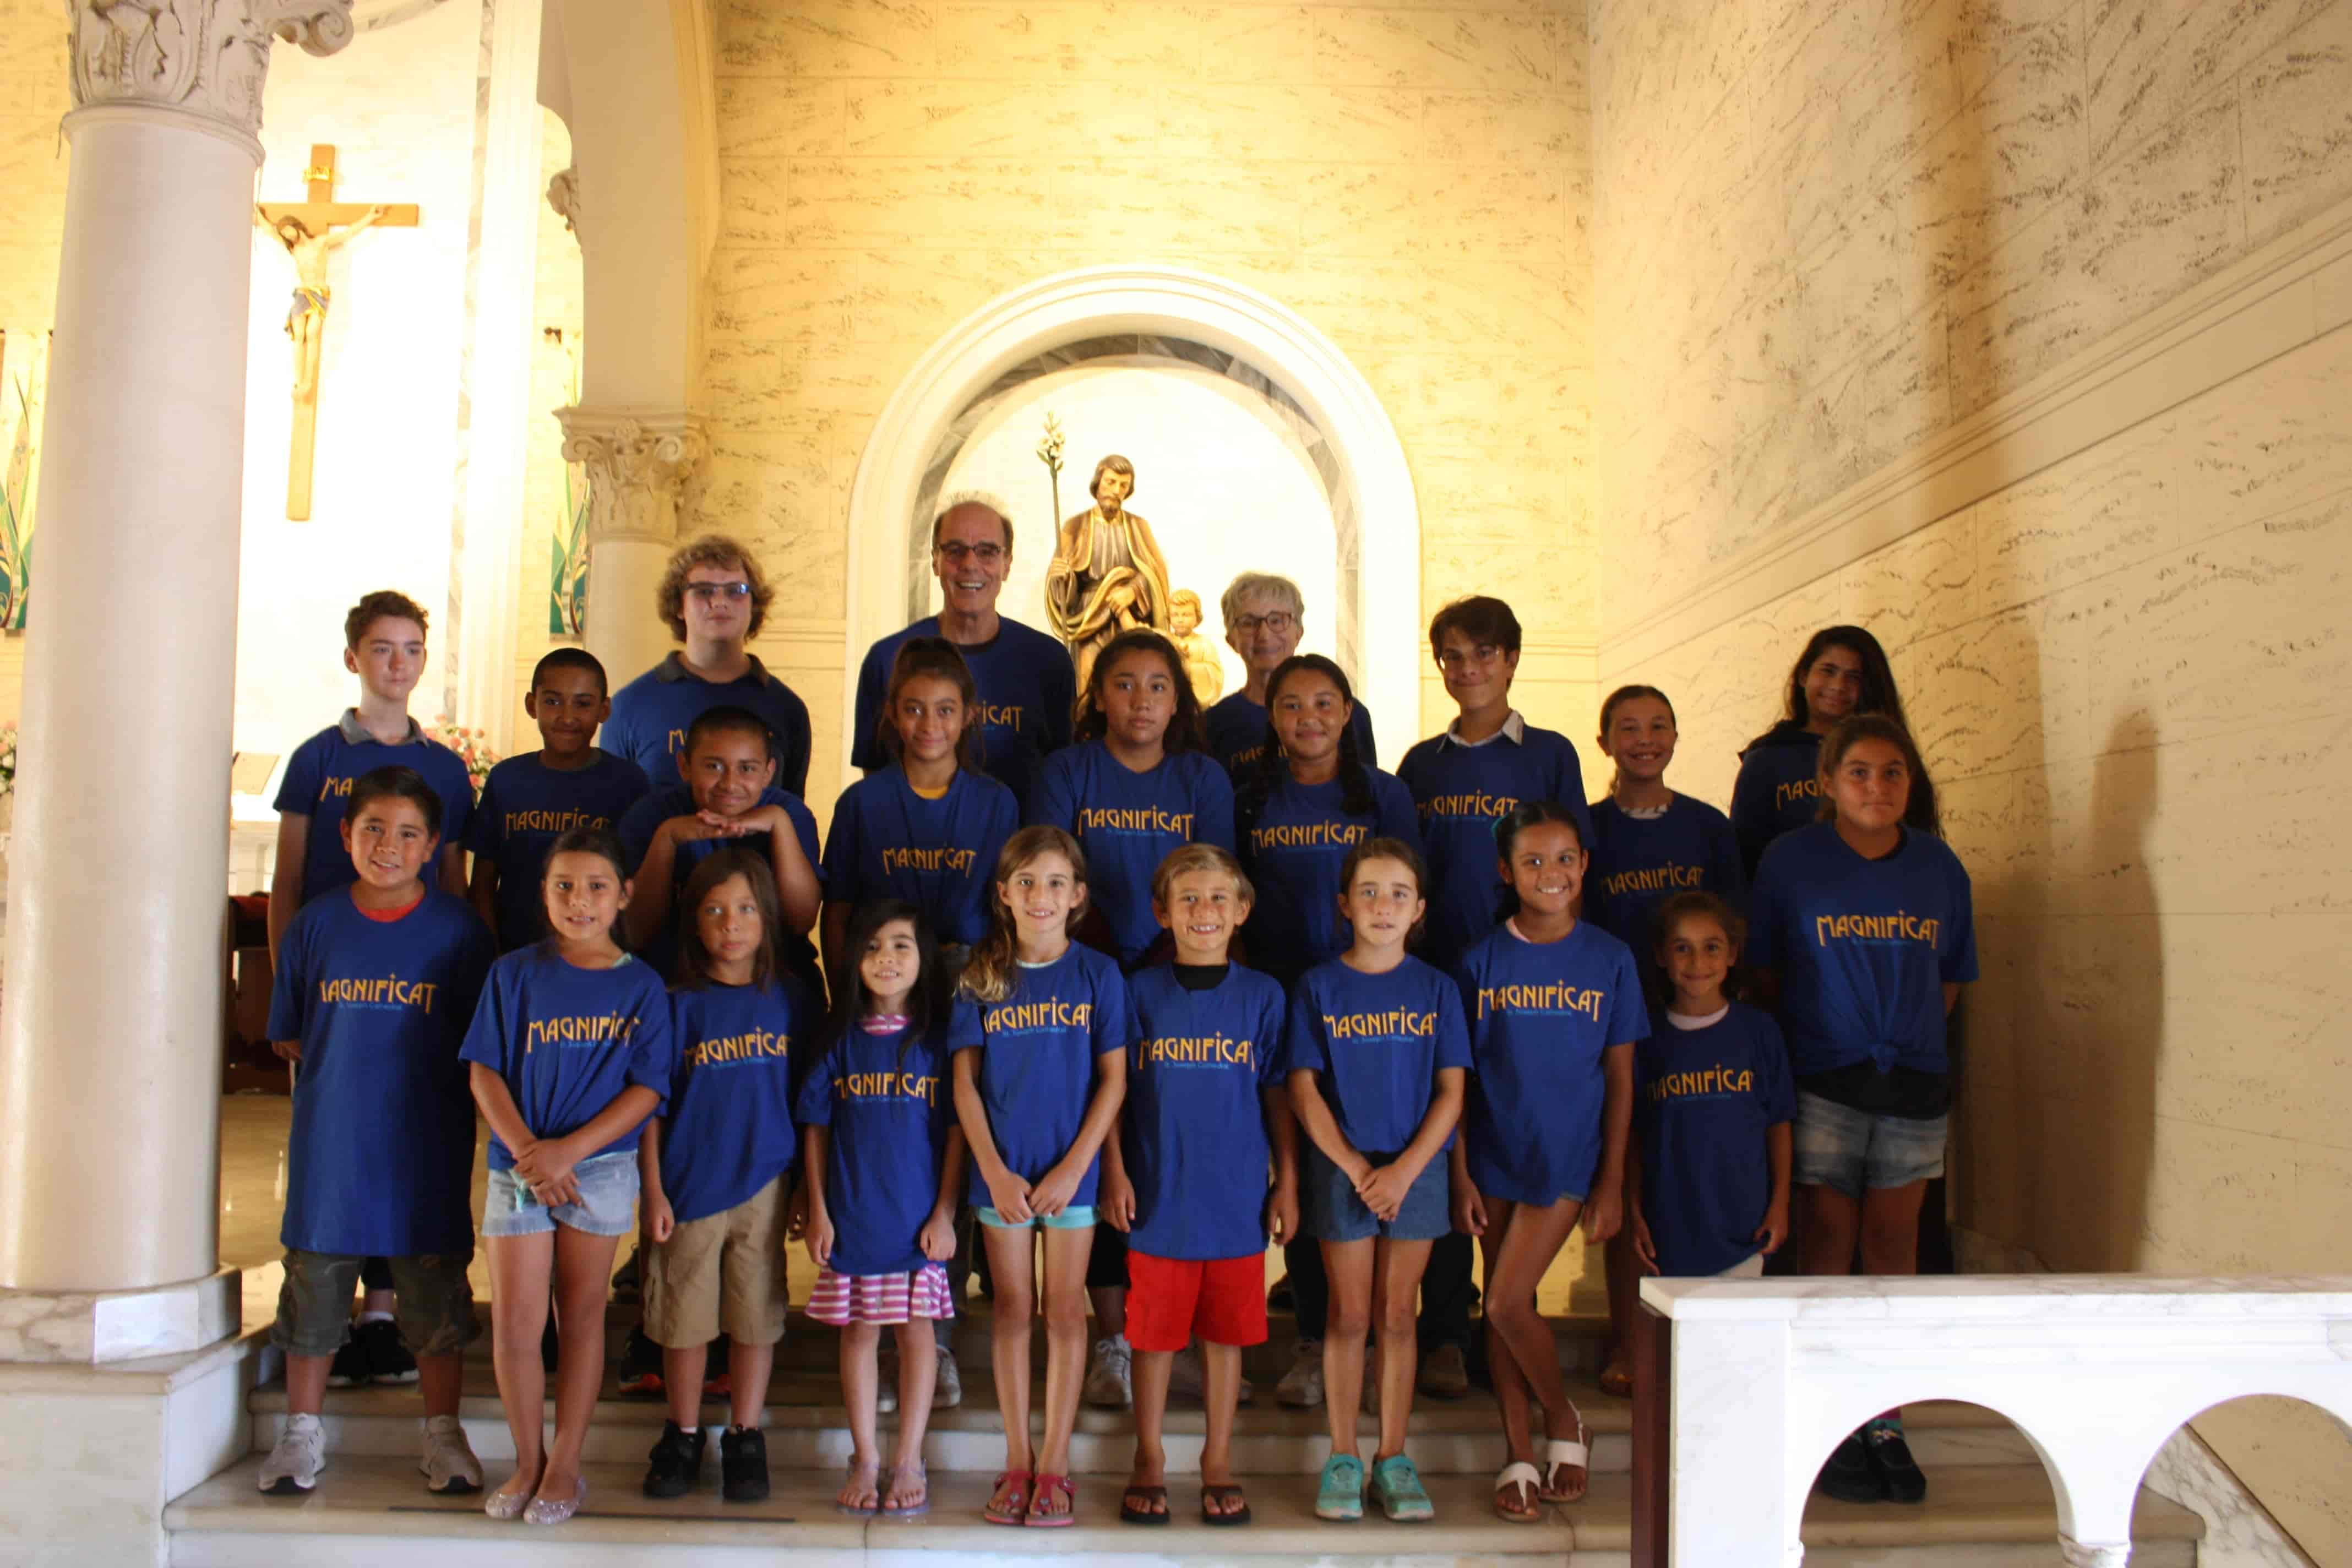 Choir Camp Kids Lead Worship 10:30 Mass